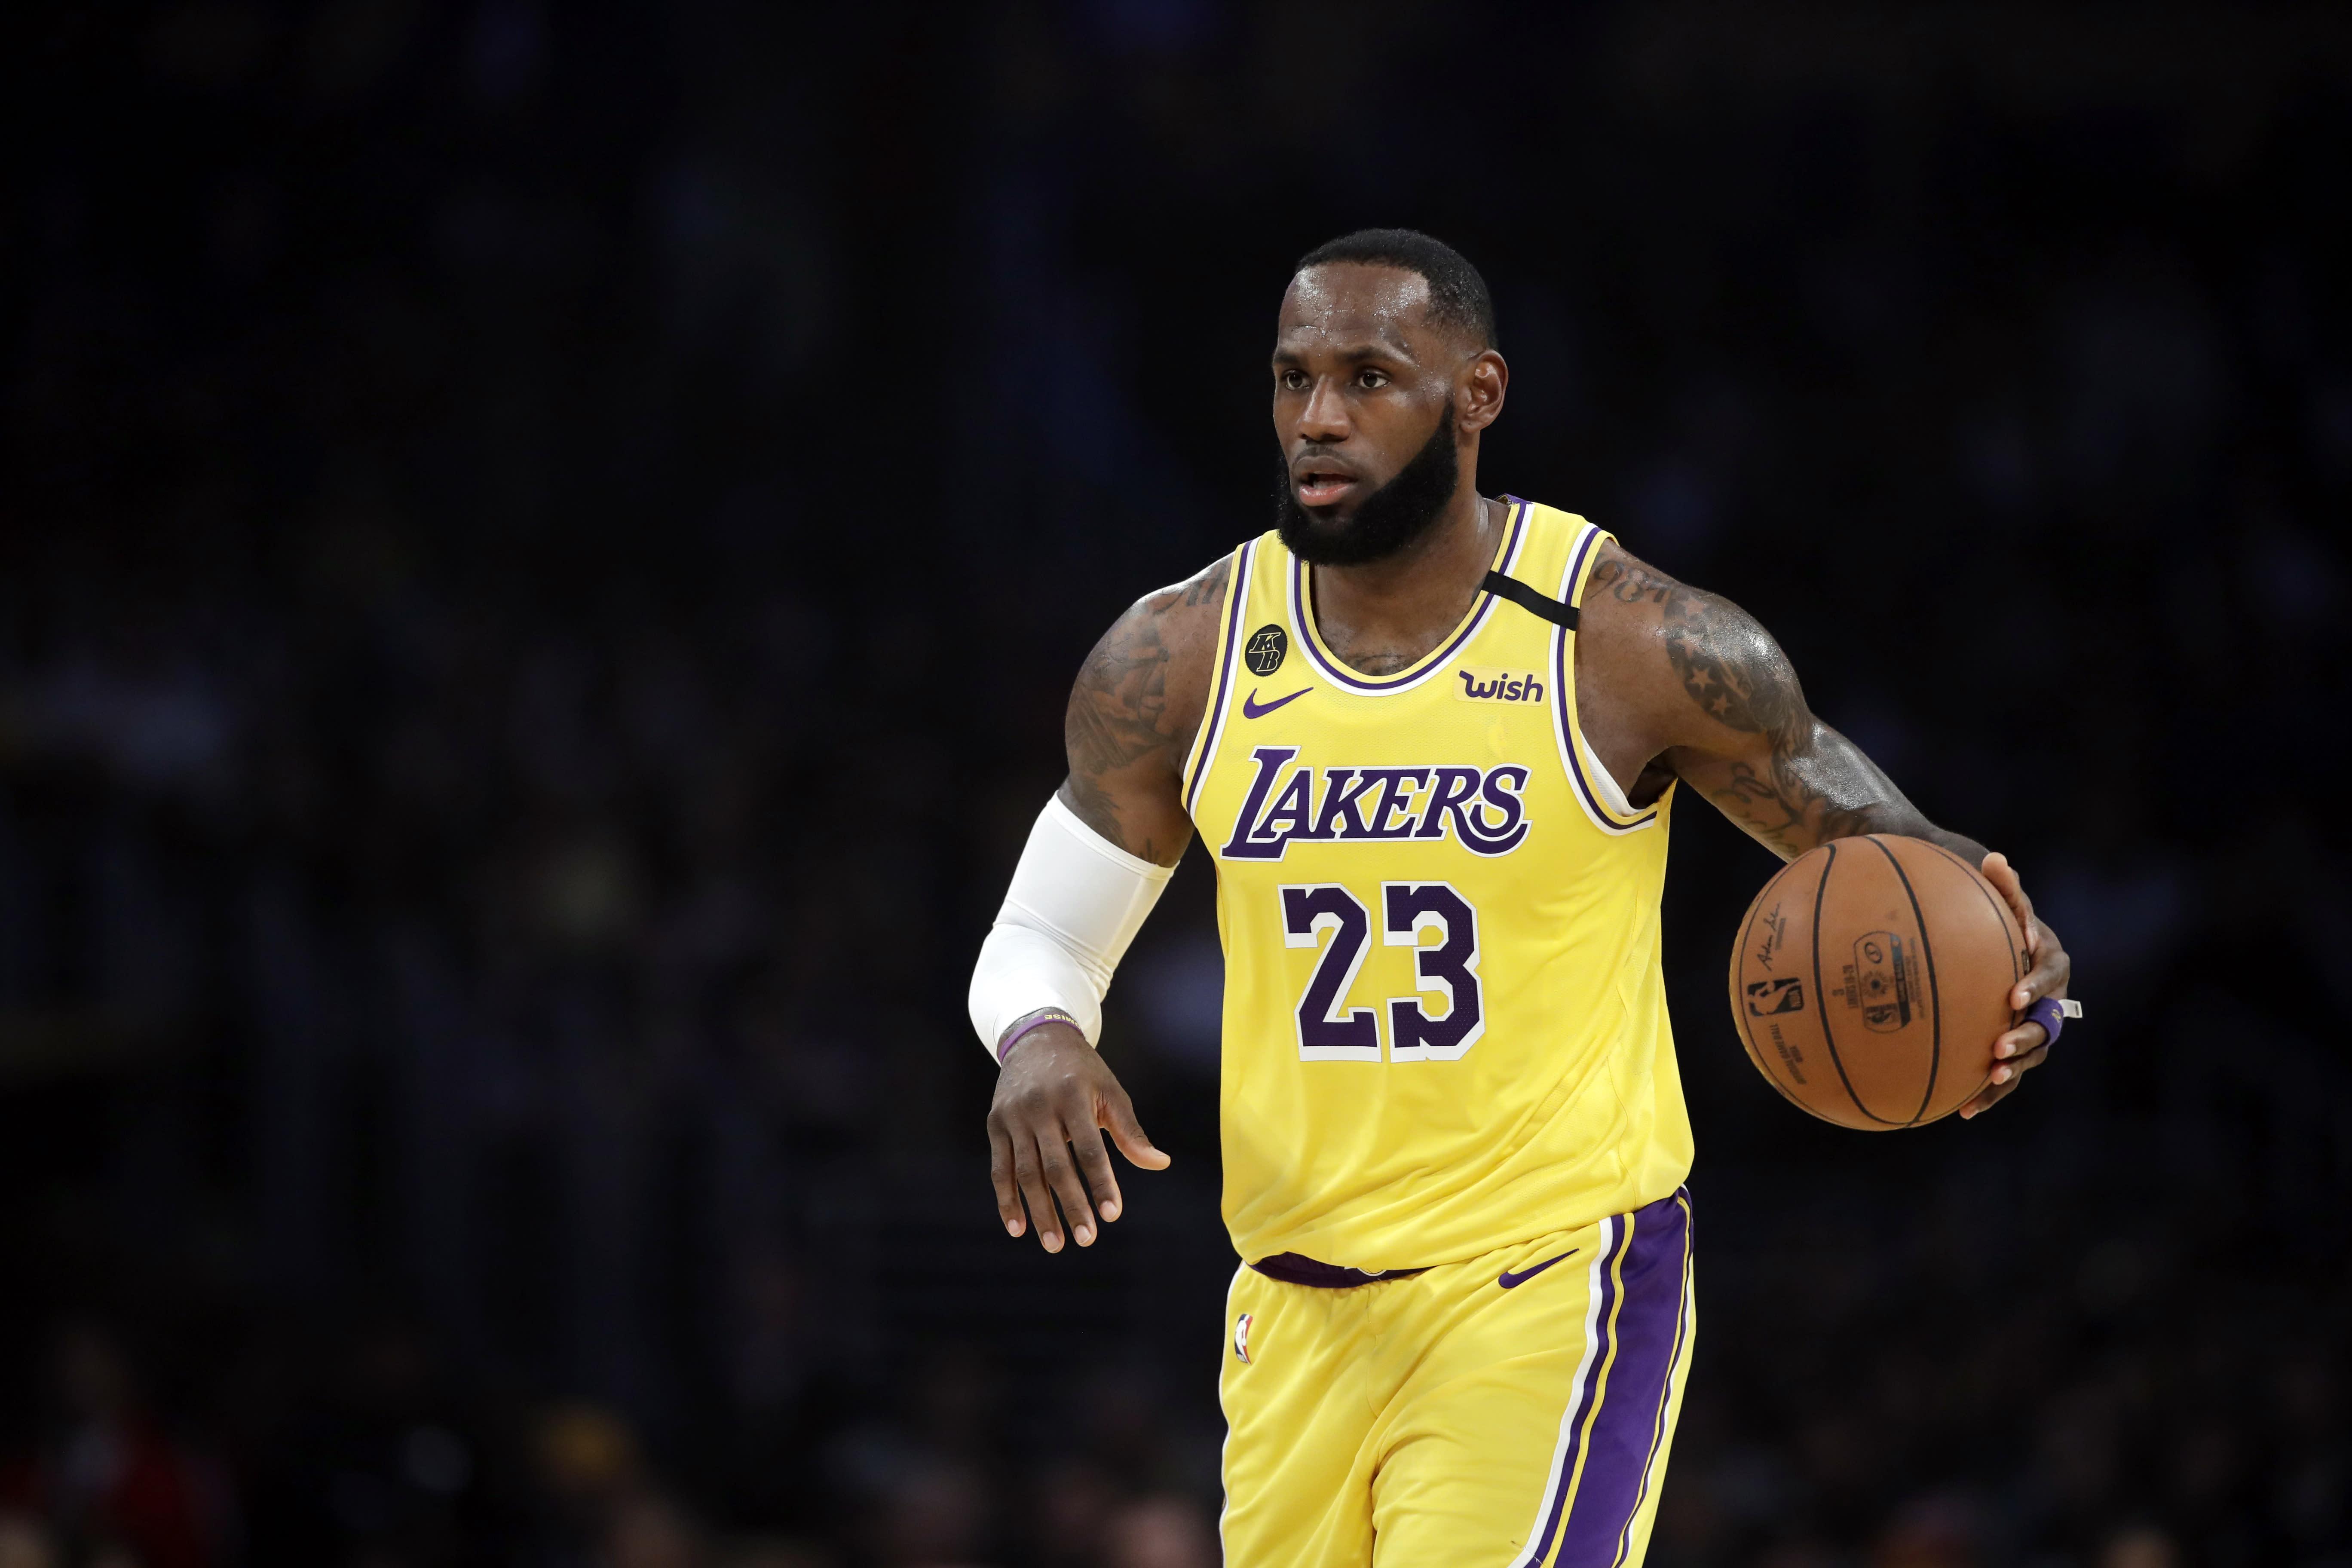 LeBron James: No 'Closure' if NBA Season Doesn't Resume